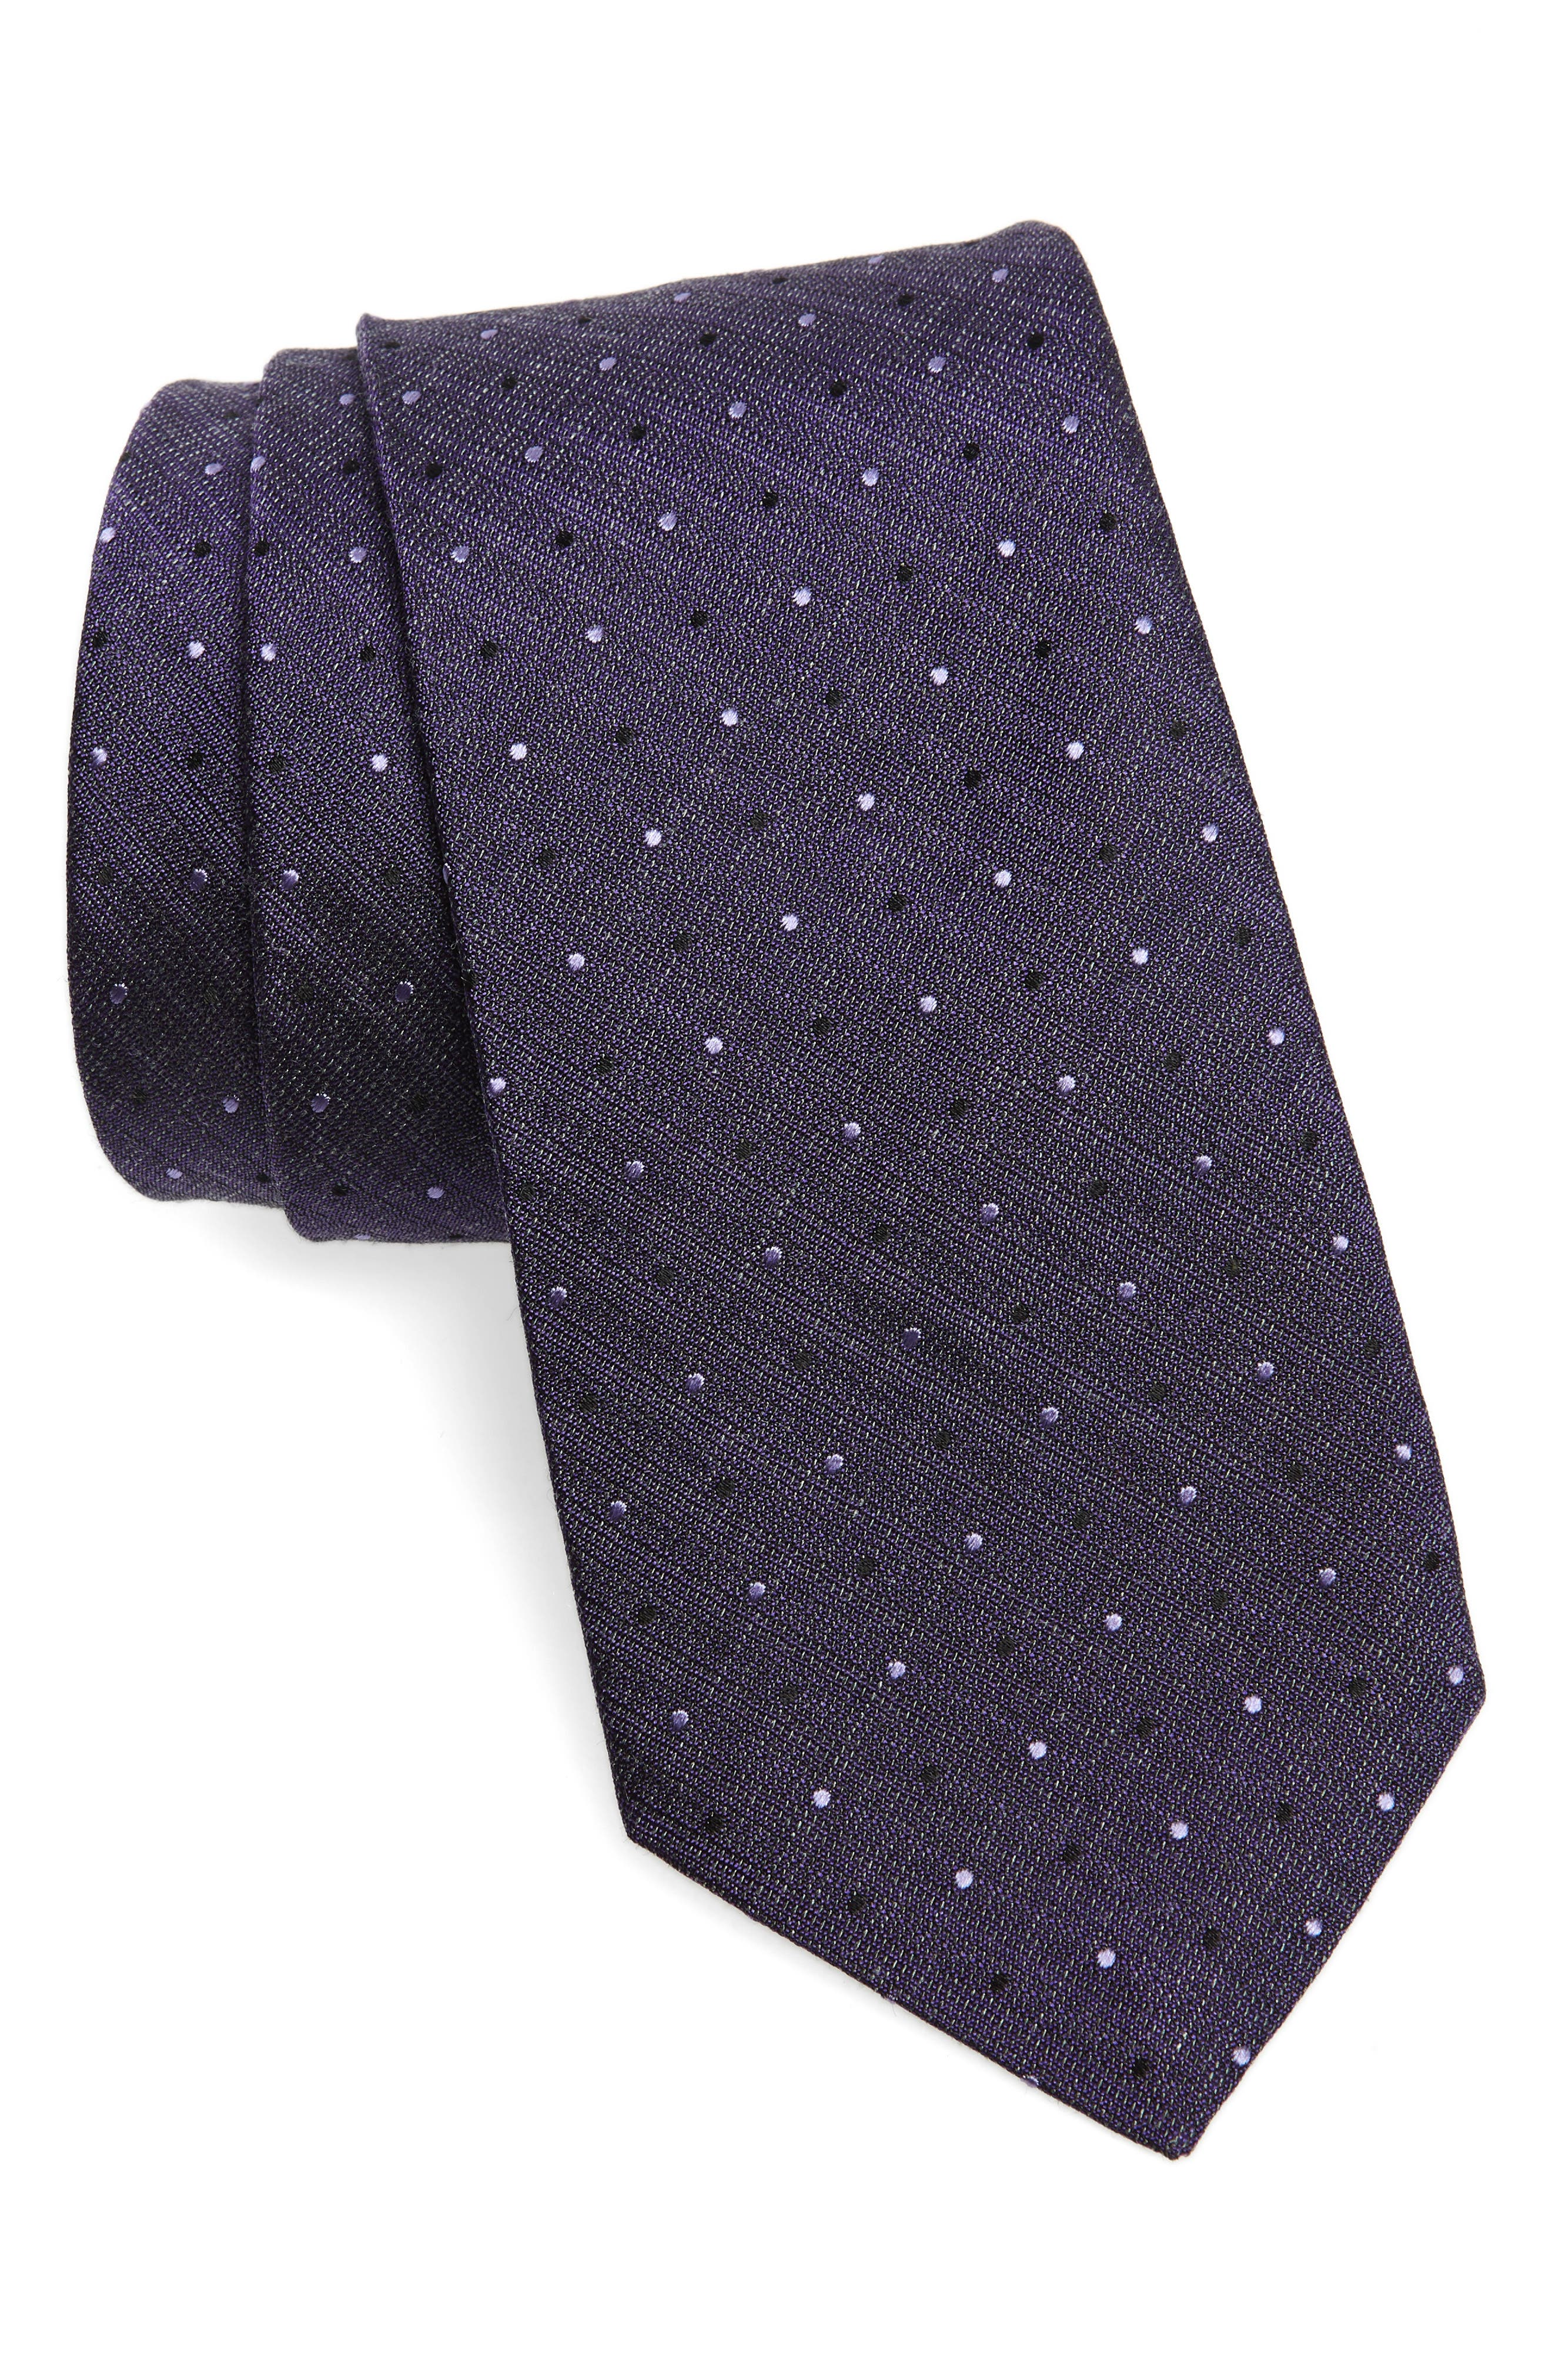 Dot Tie,                         Main,                         color, PURPLE